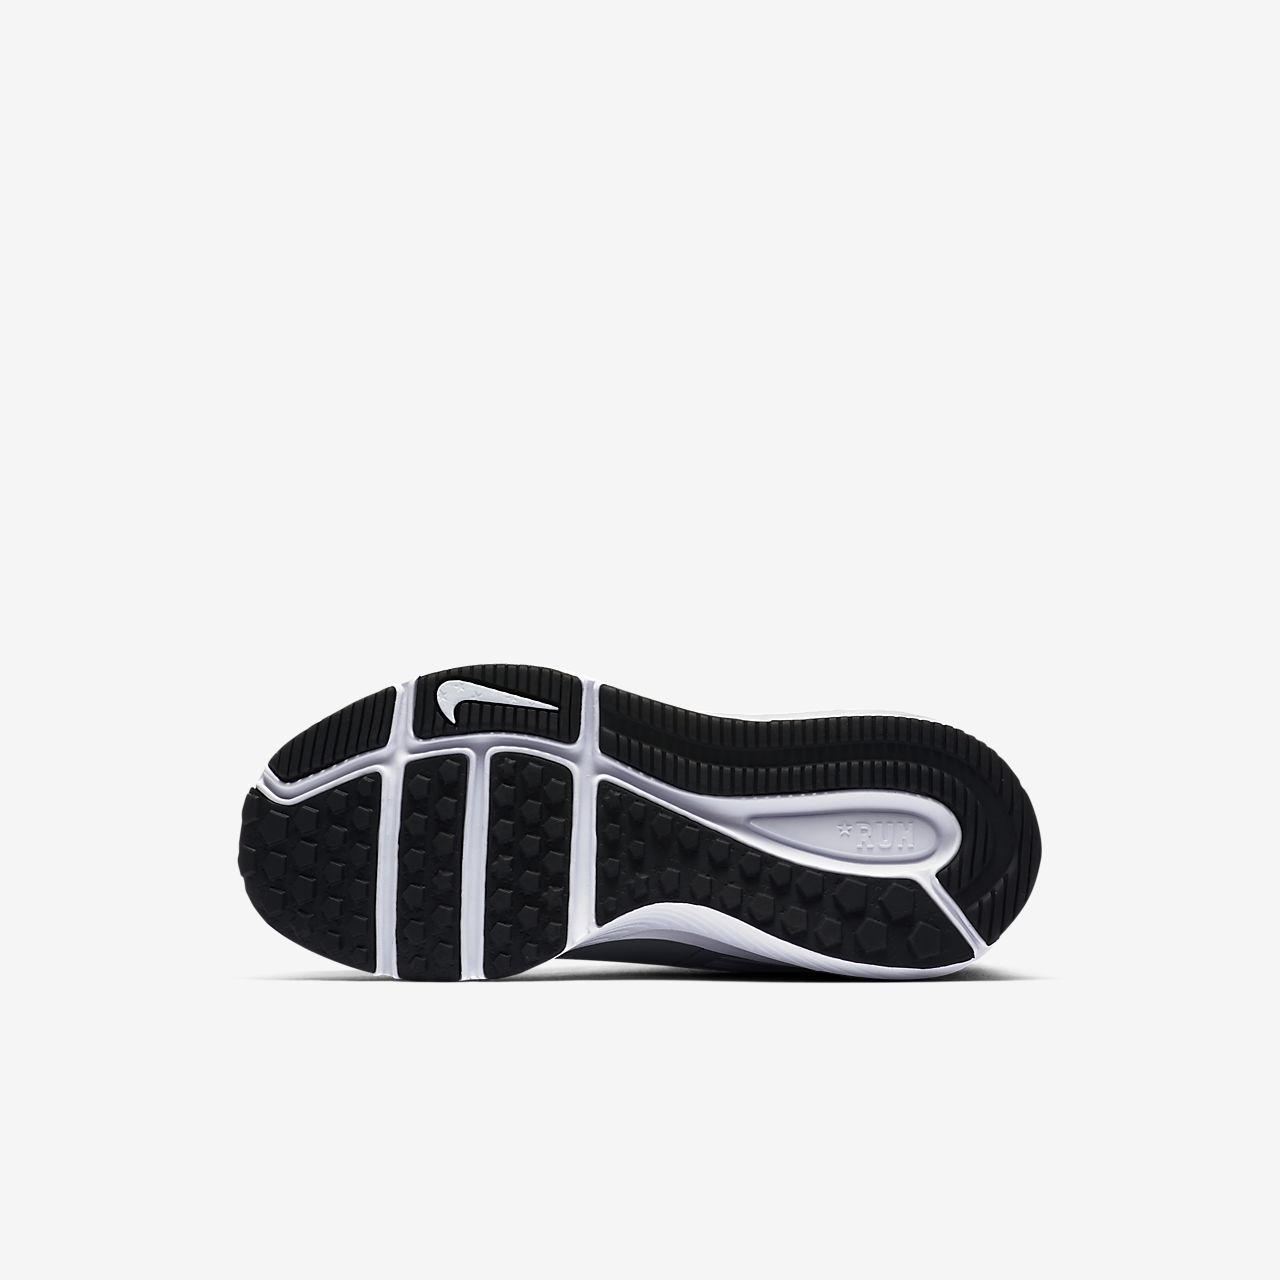 62b1881fca4 Nike Star Runner Younger Kids  Shoe. Nike.com GB